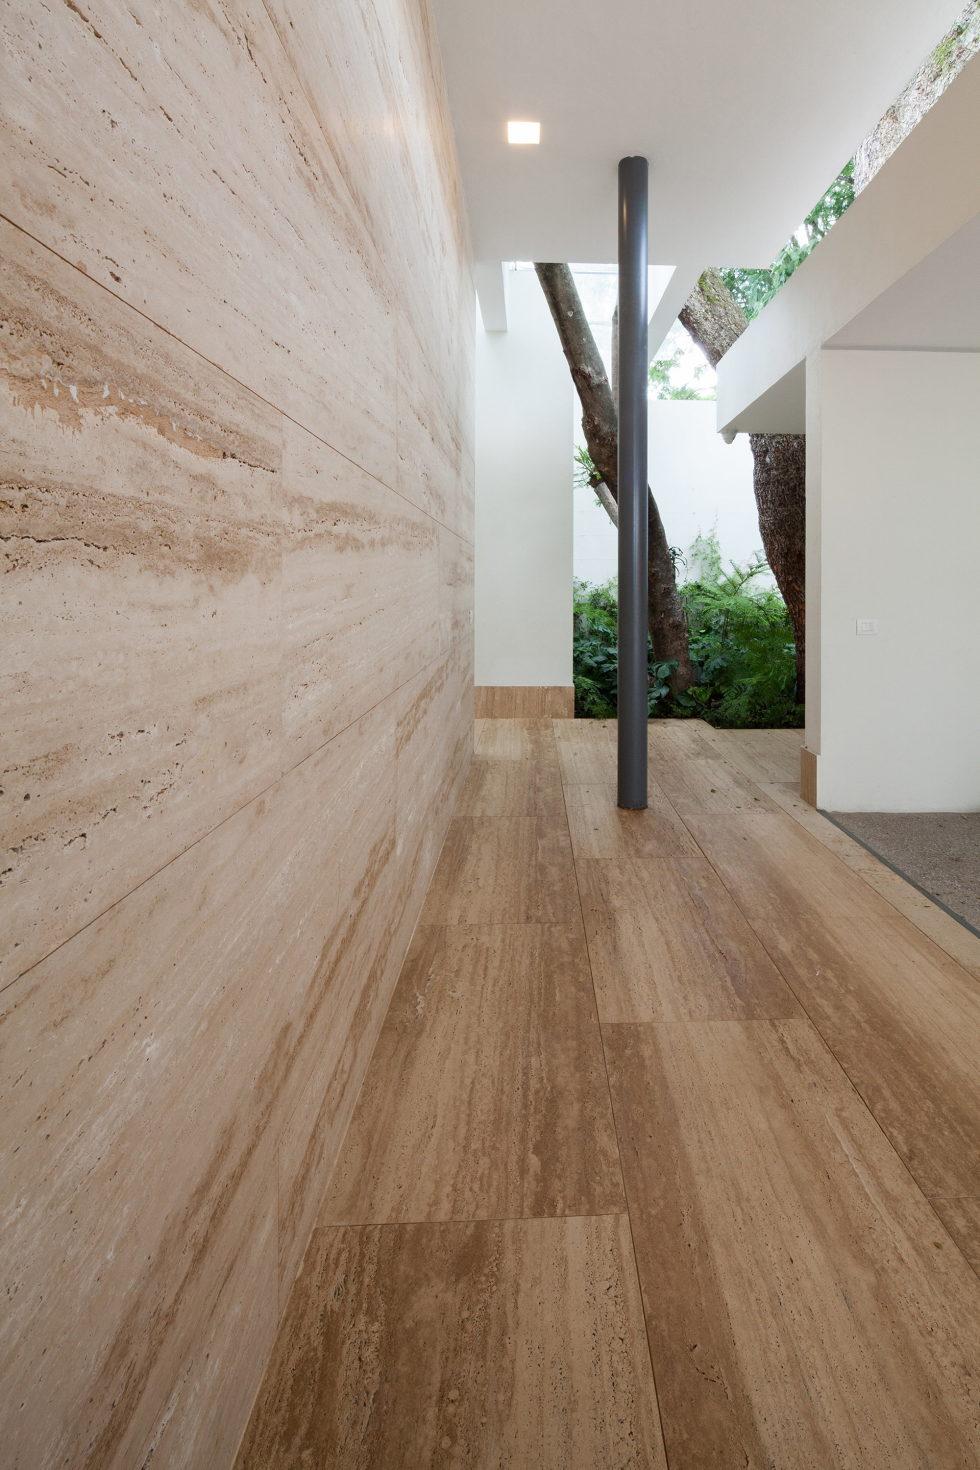 Casa Ocho Jardines Residency In Minimalism Style From Goko MX Studio 12